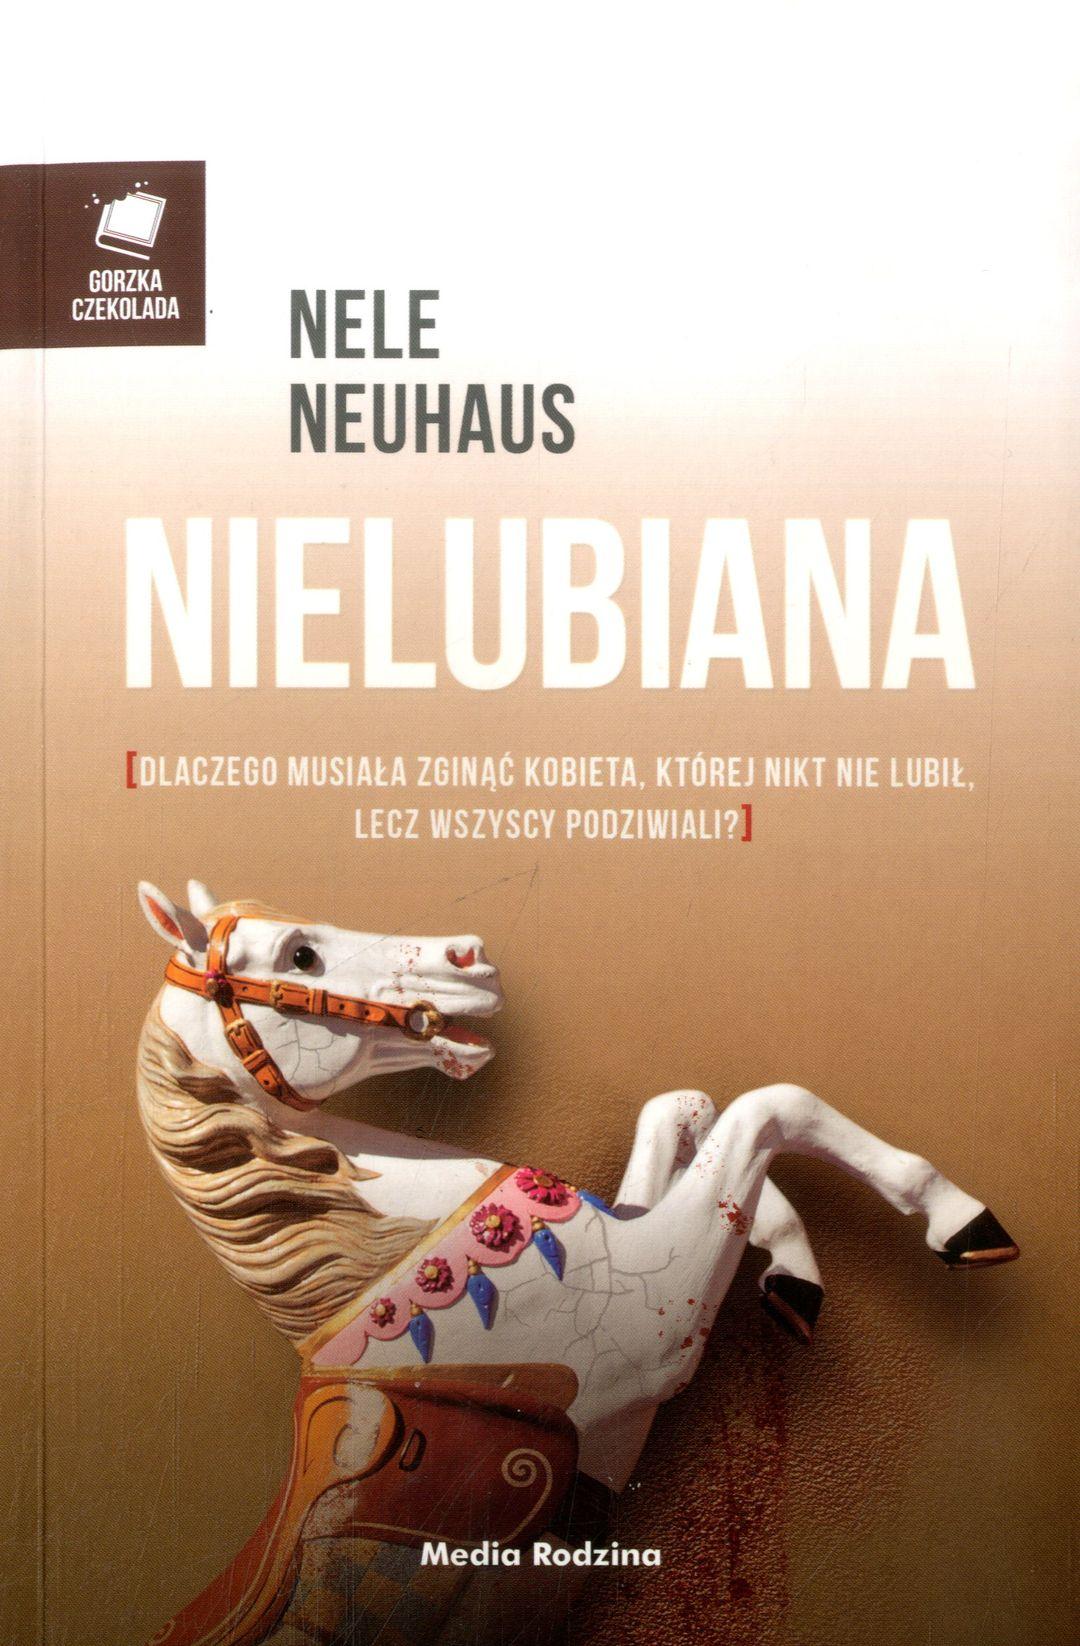 Neuhaus Nele – Nielubiana